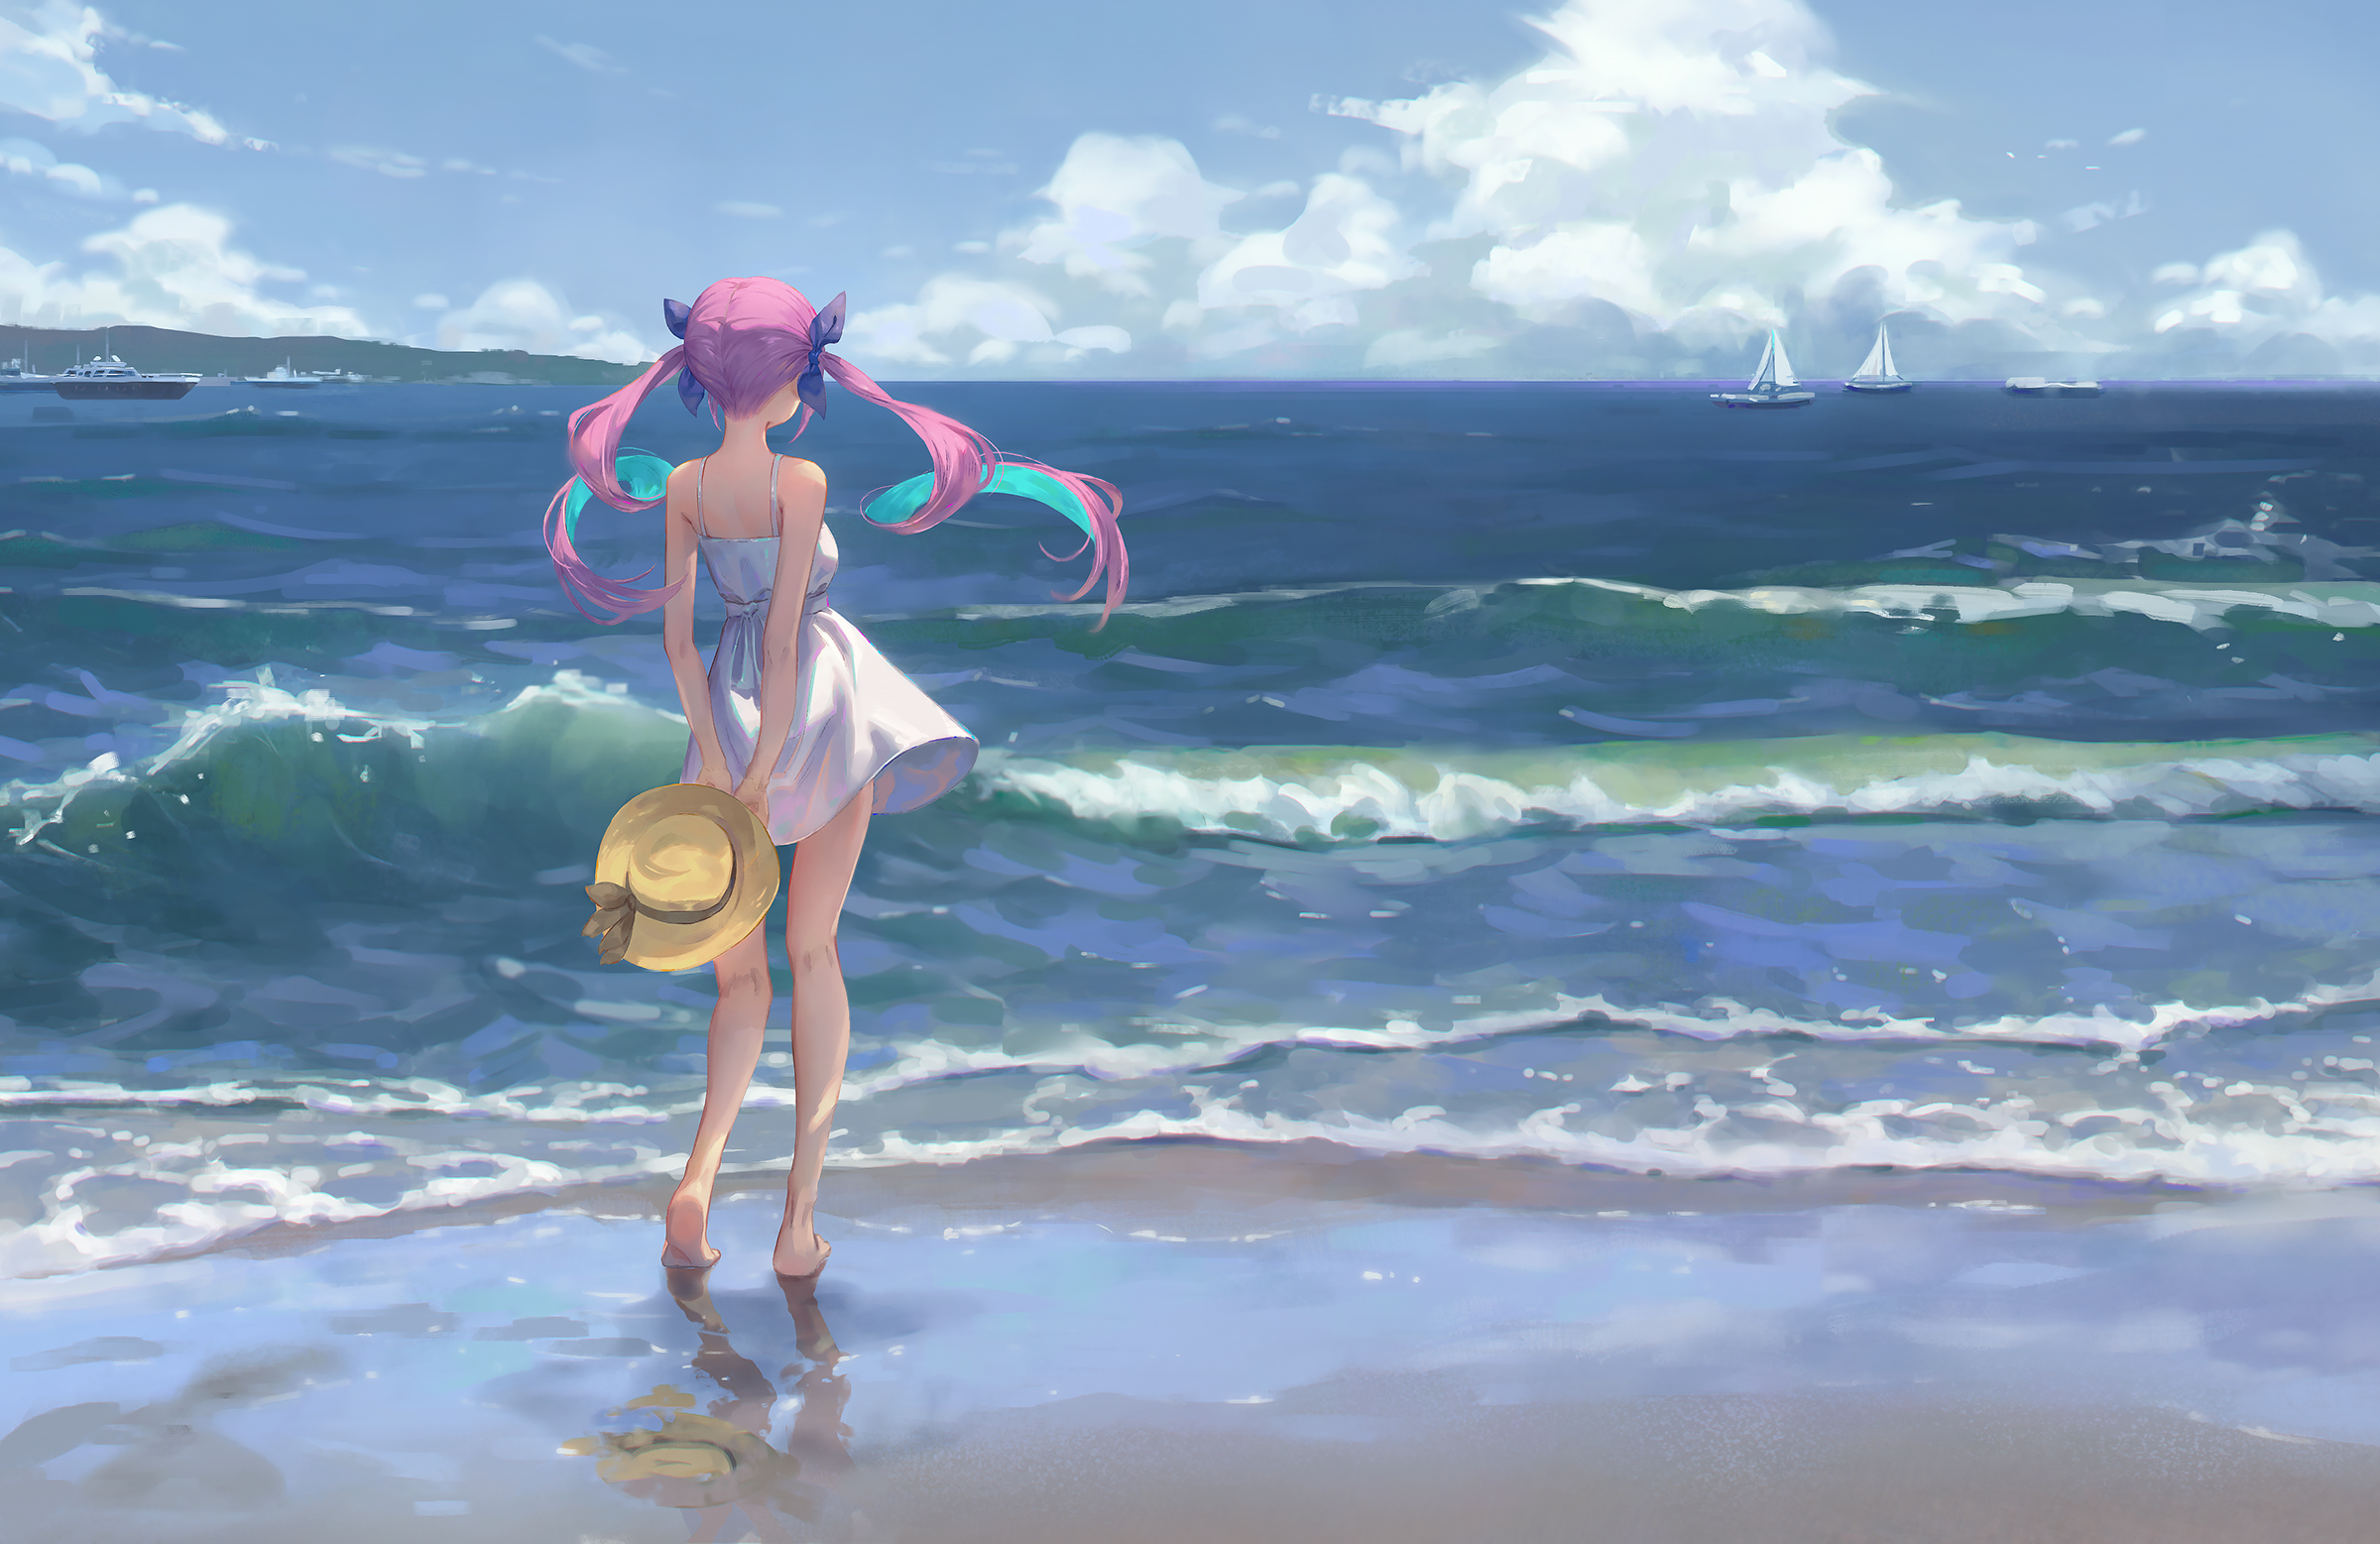 Anime Girls Dress Wind Waves Beach Barefoot Sun Dress Twintails Violet Hair Gawain Minato Aqua Holol 2400x1557